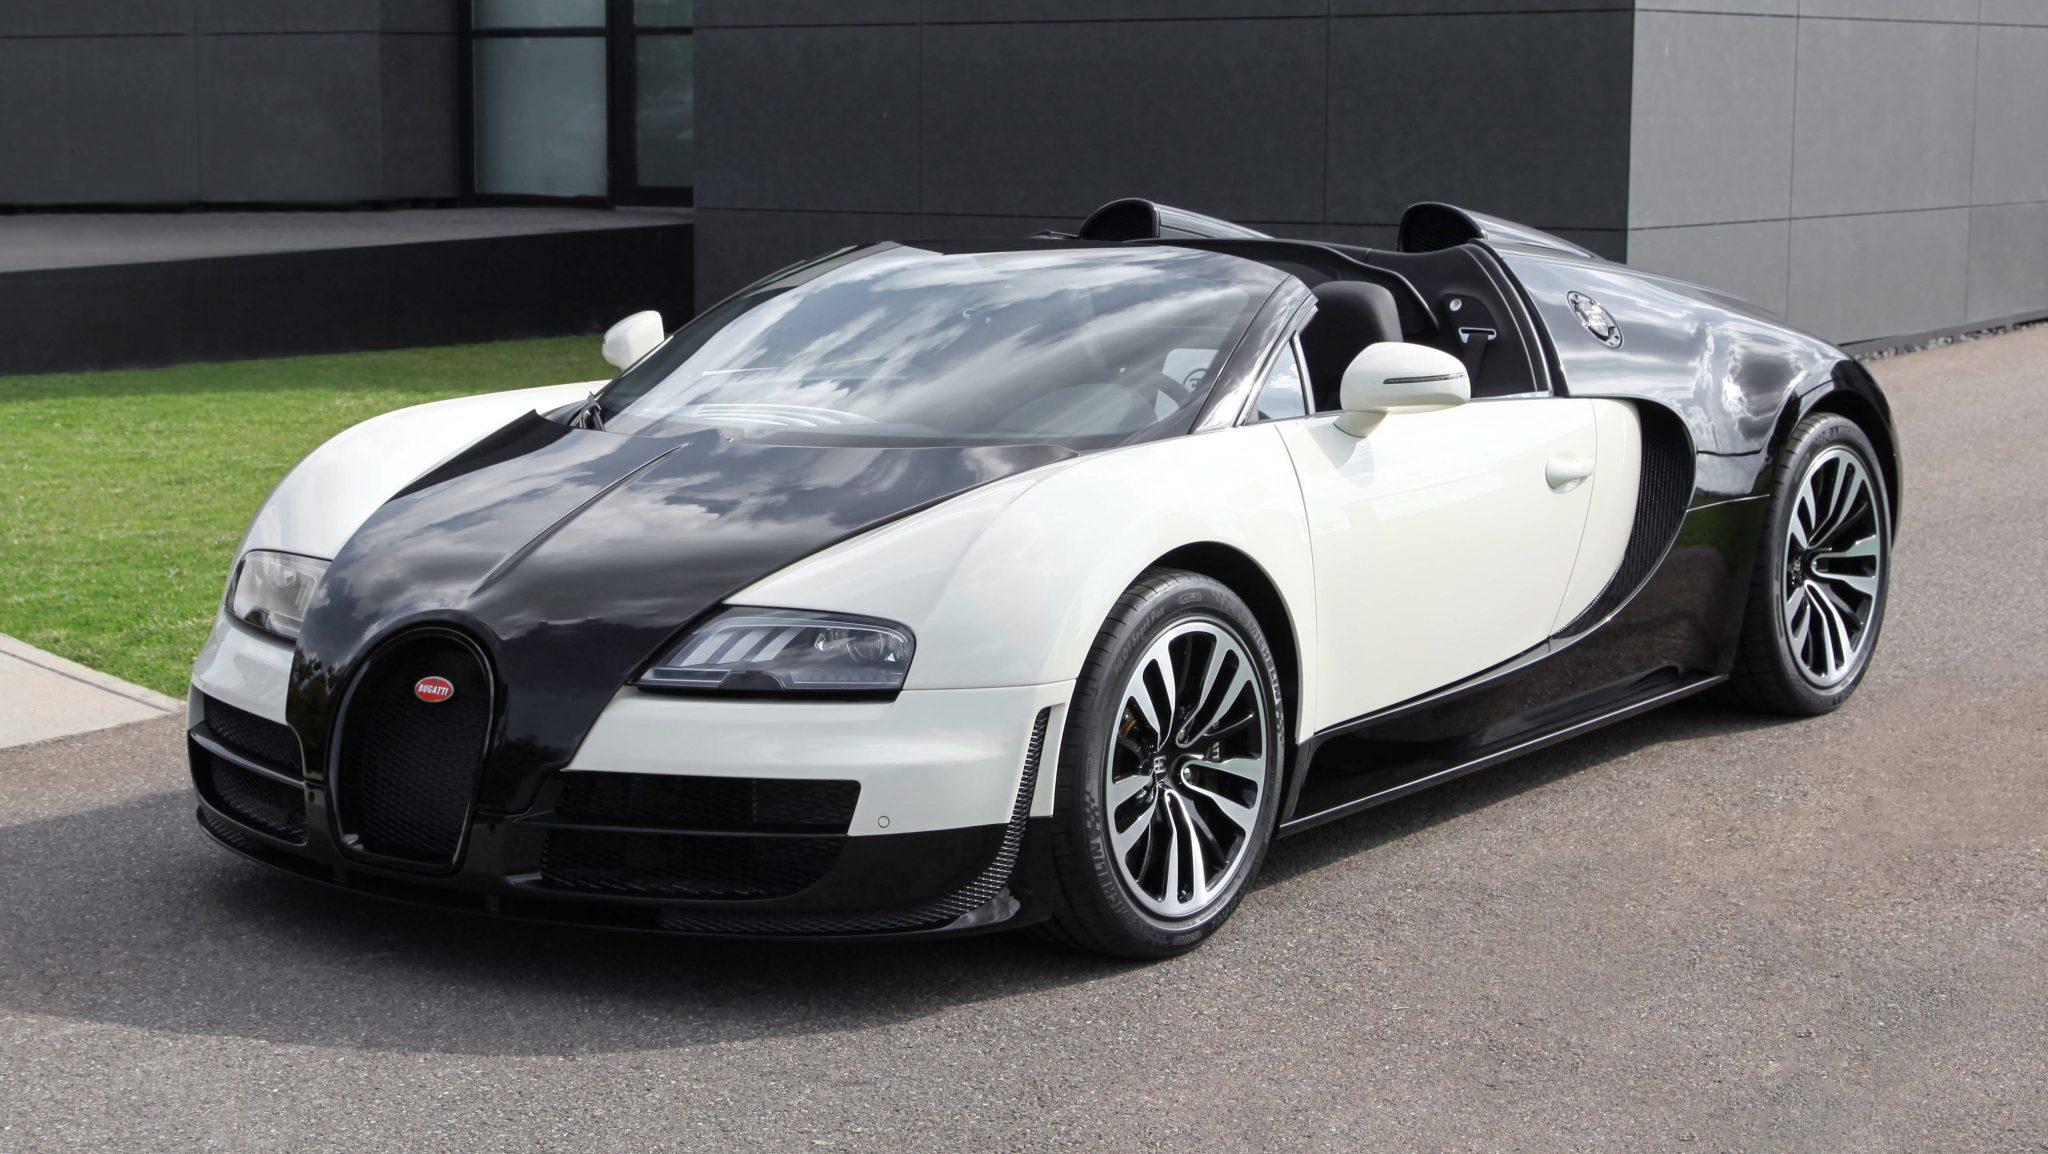 Bugatti Veyron 16.4 Grand Sport Vitesse Lang Lang